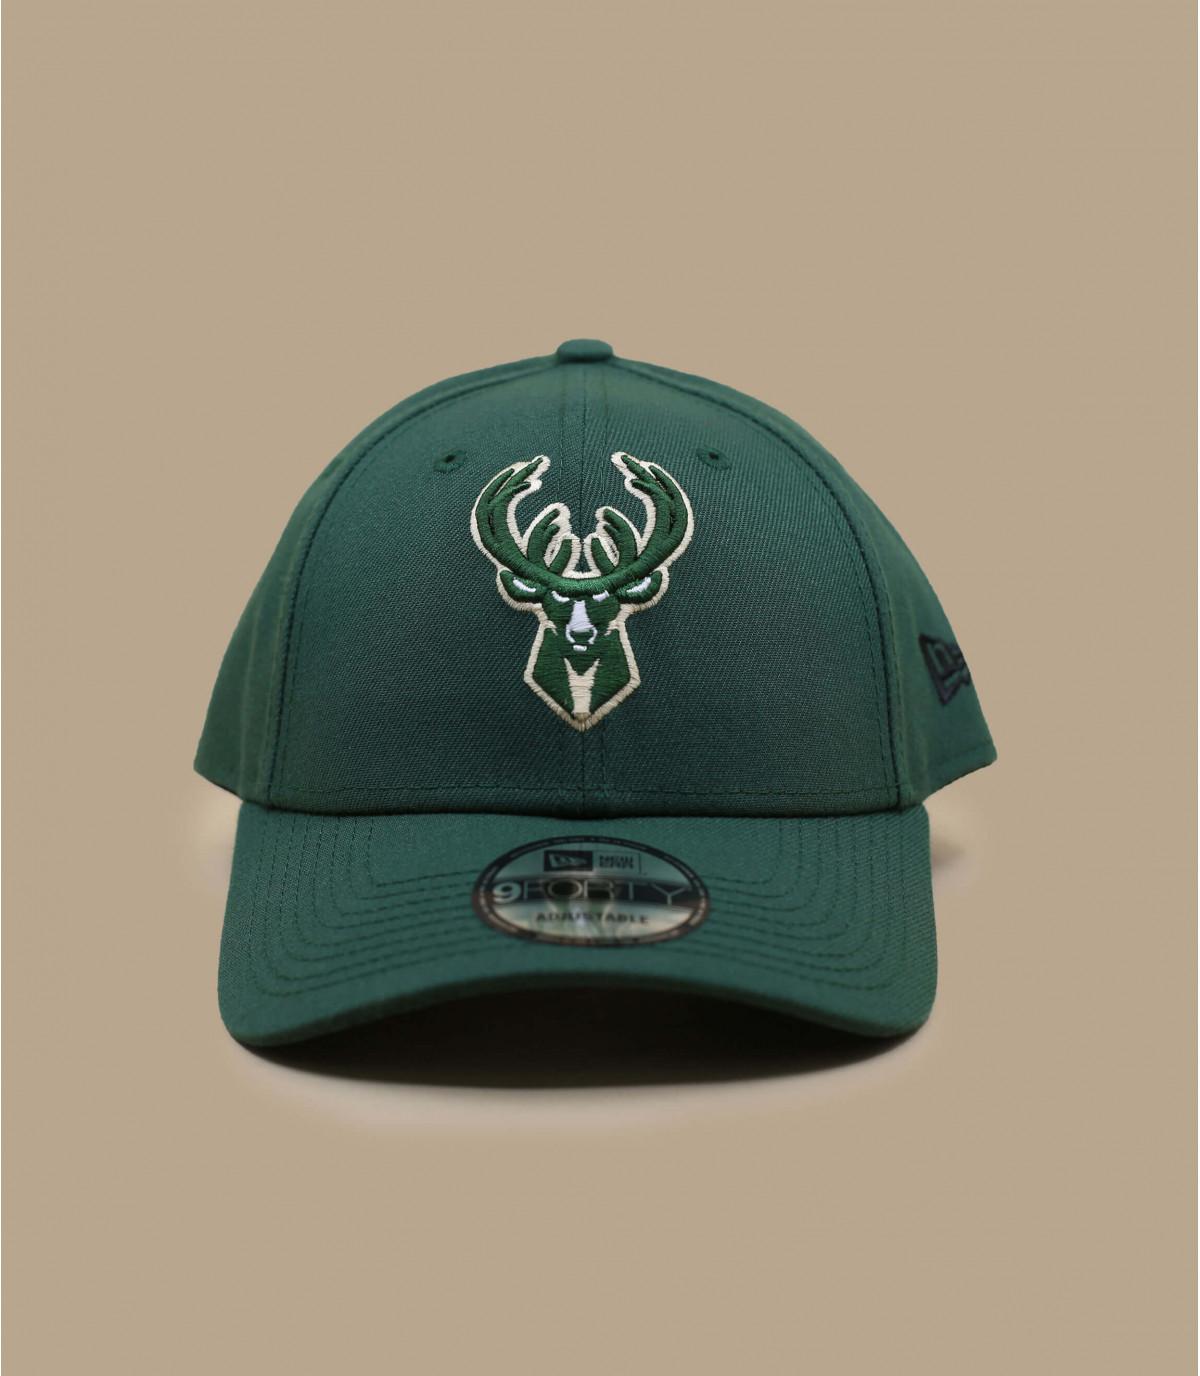 Curved Cap Bucks grün